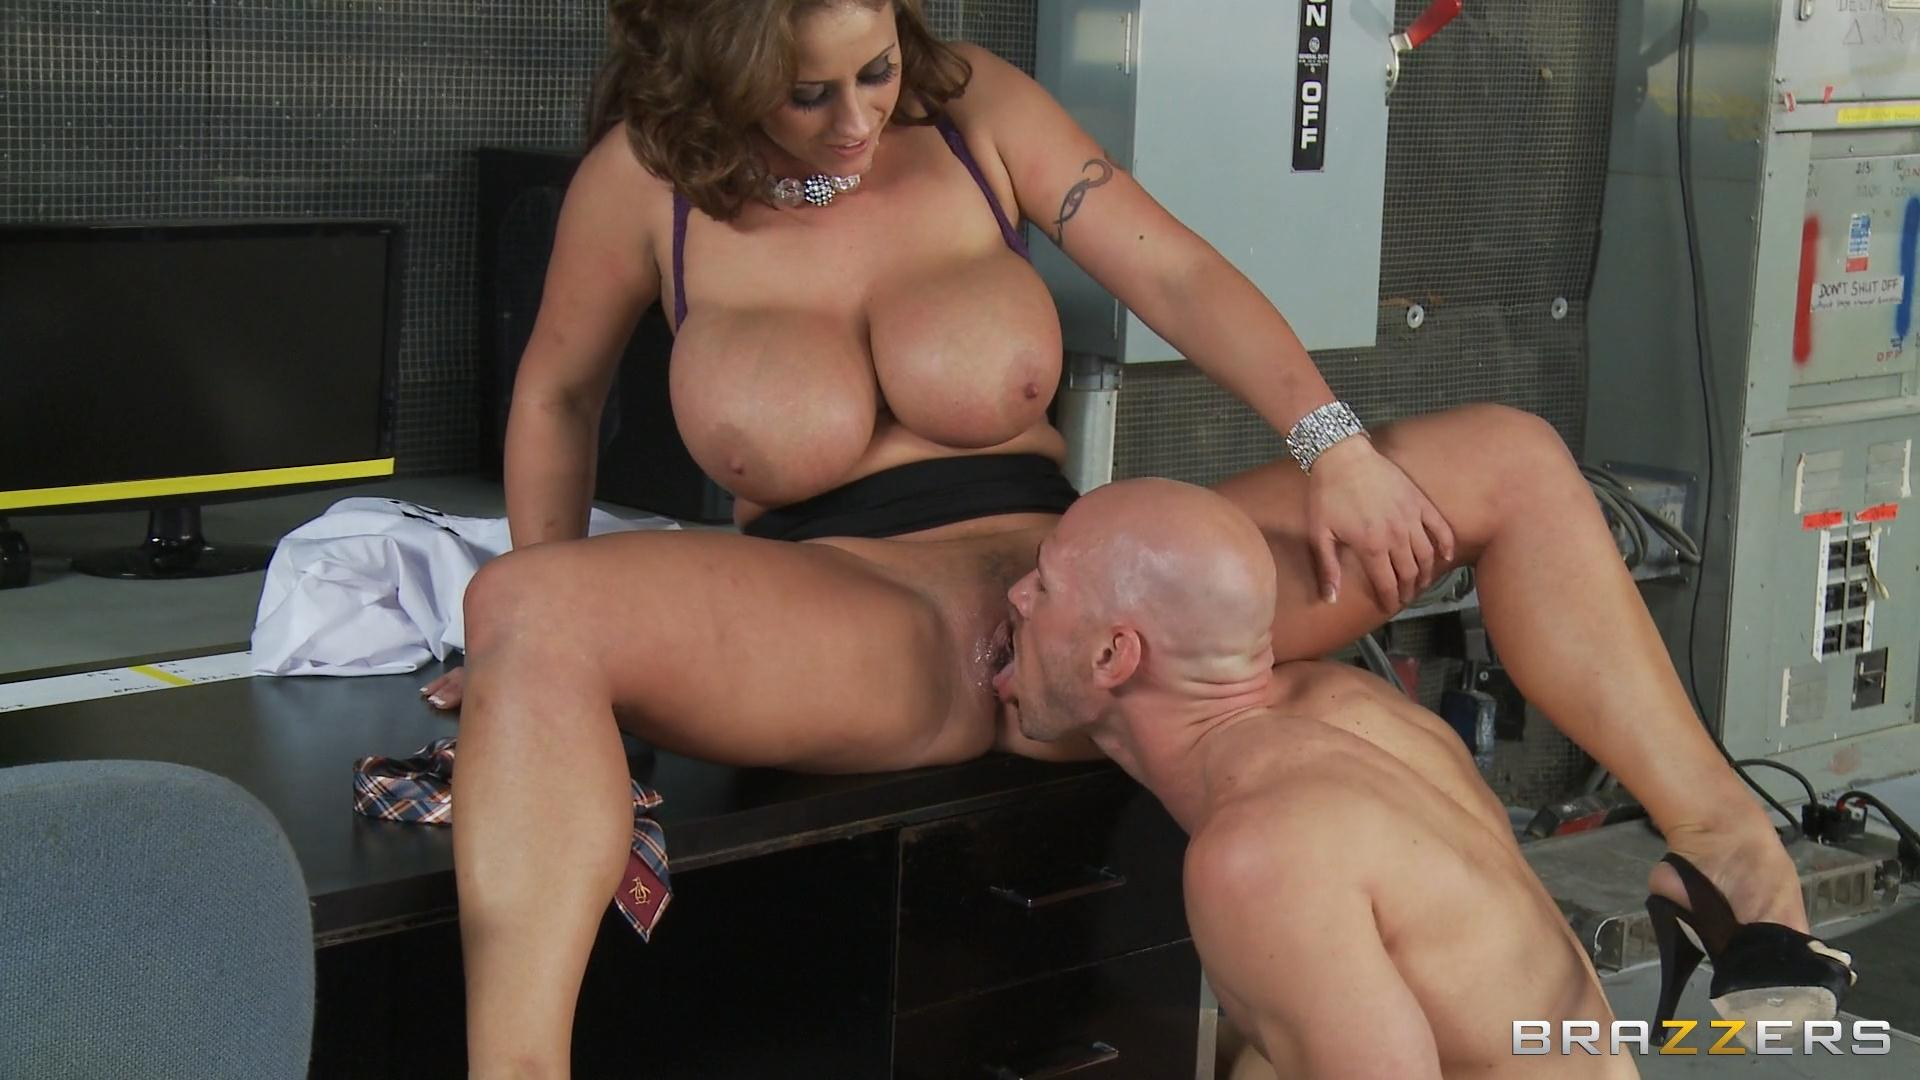 смотреть онлайн порно в hd от brazzers-зм2